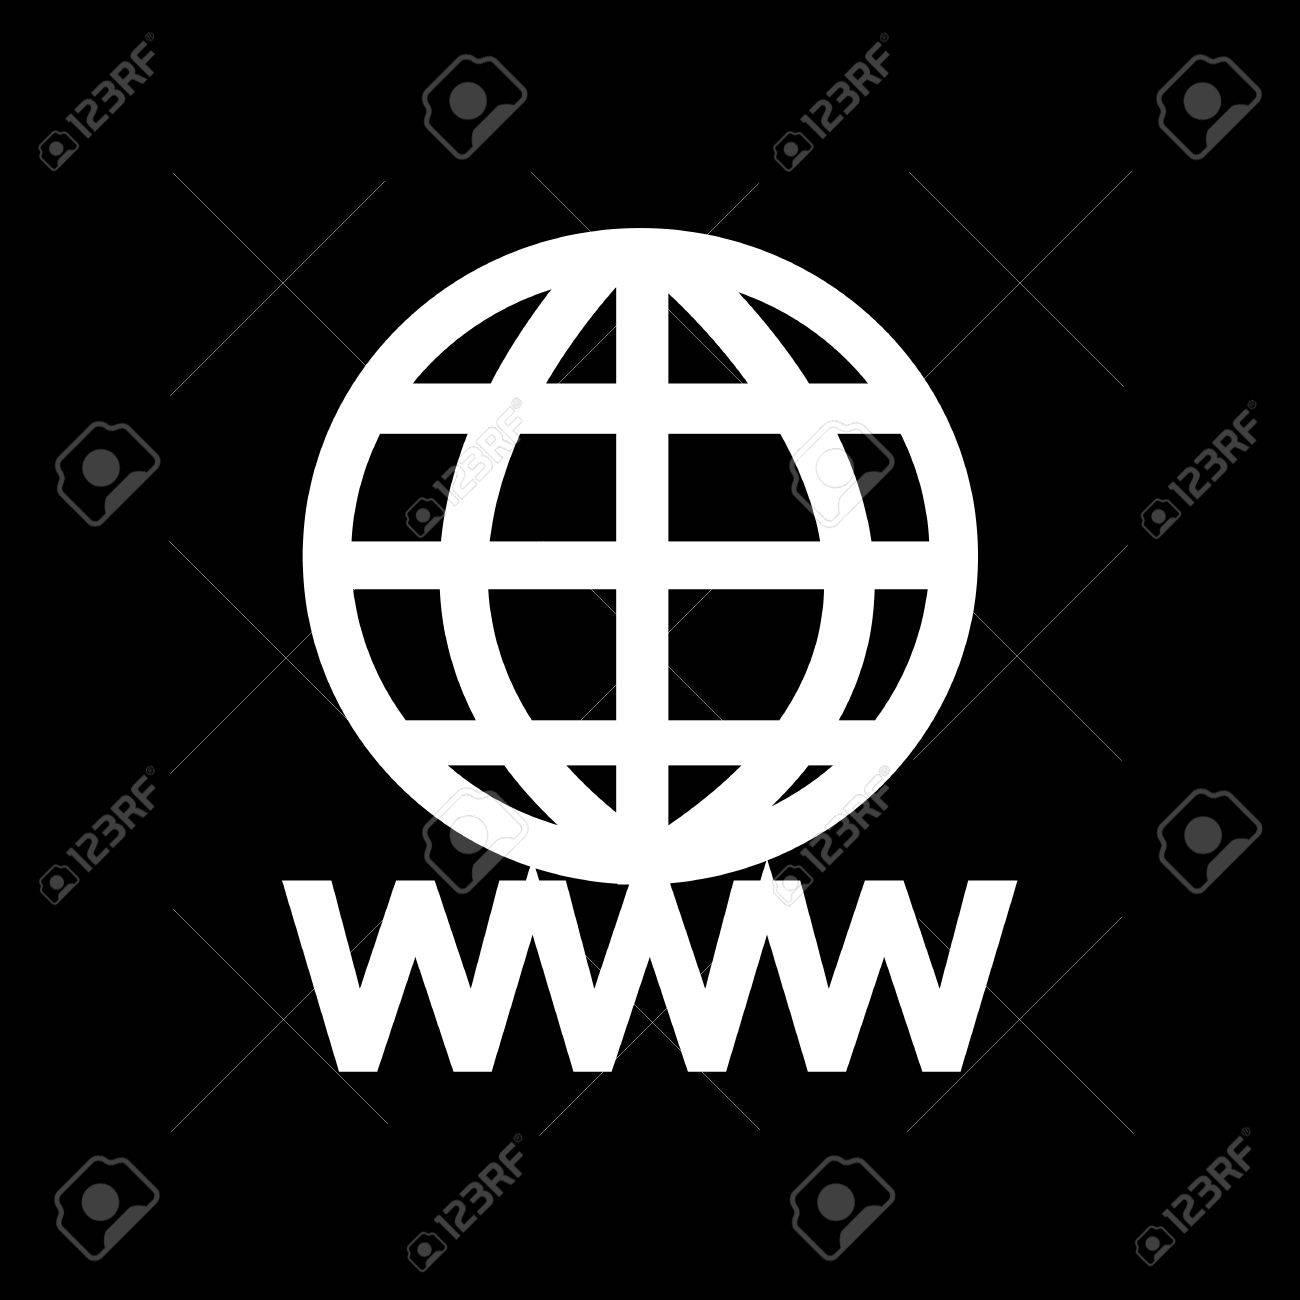 1300x1300 World Wide Web Clipart Symbol Vector 28